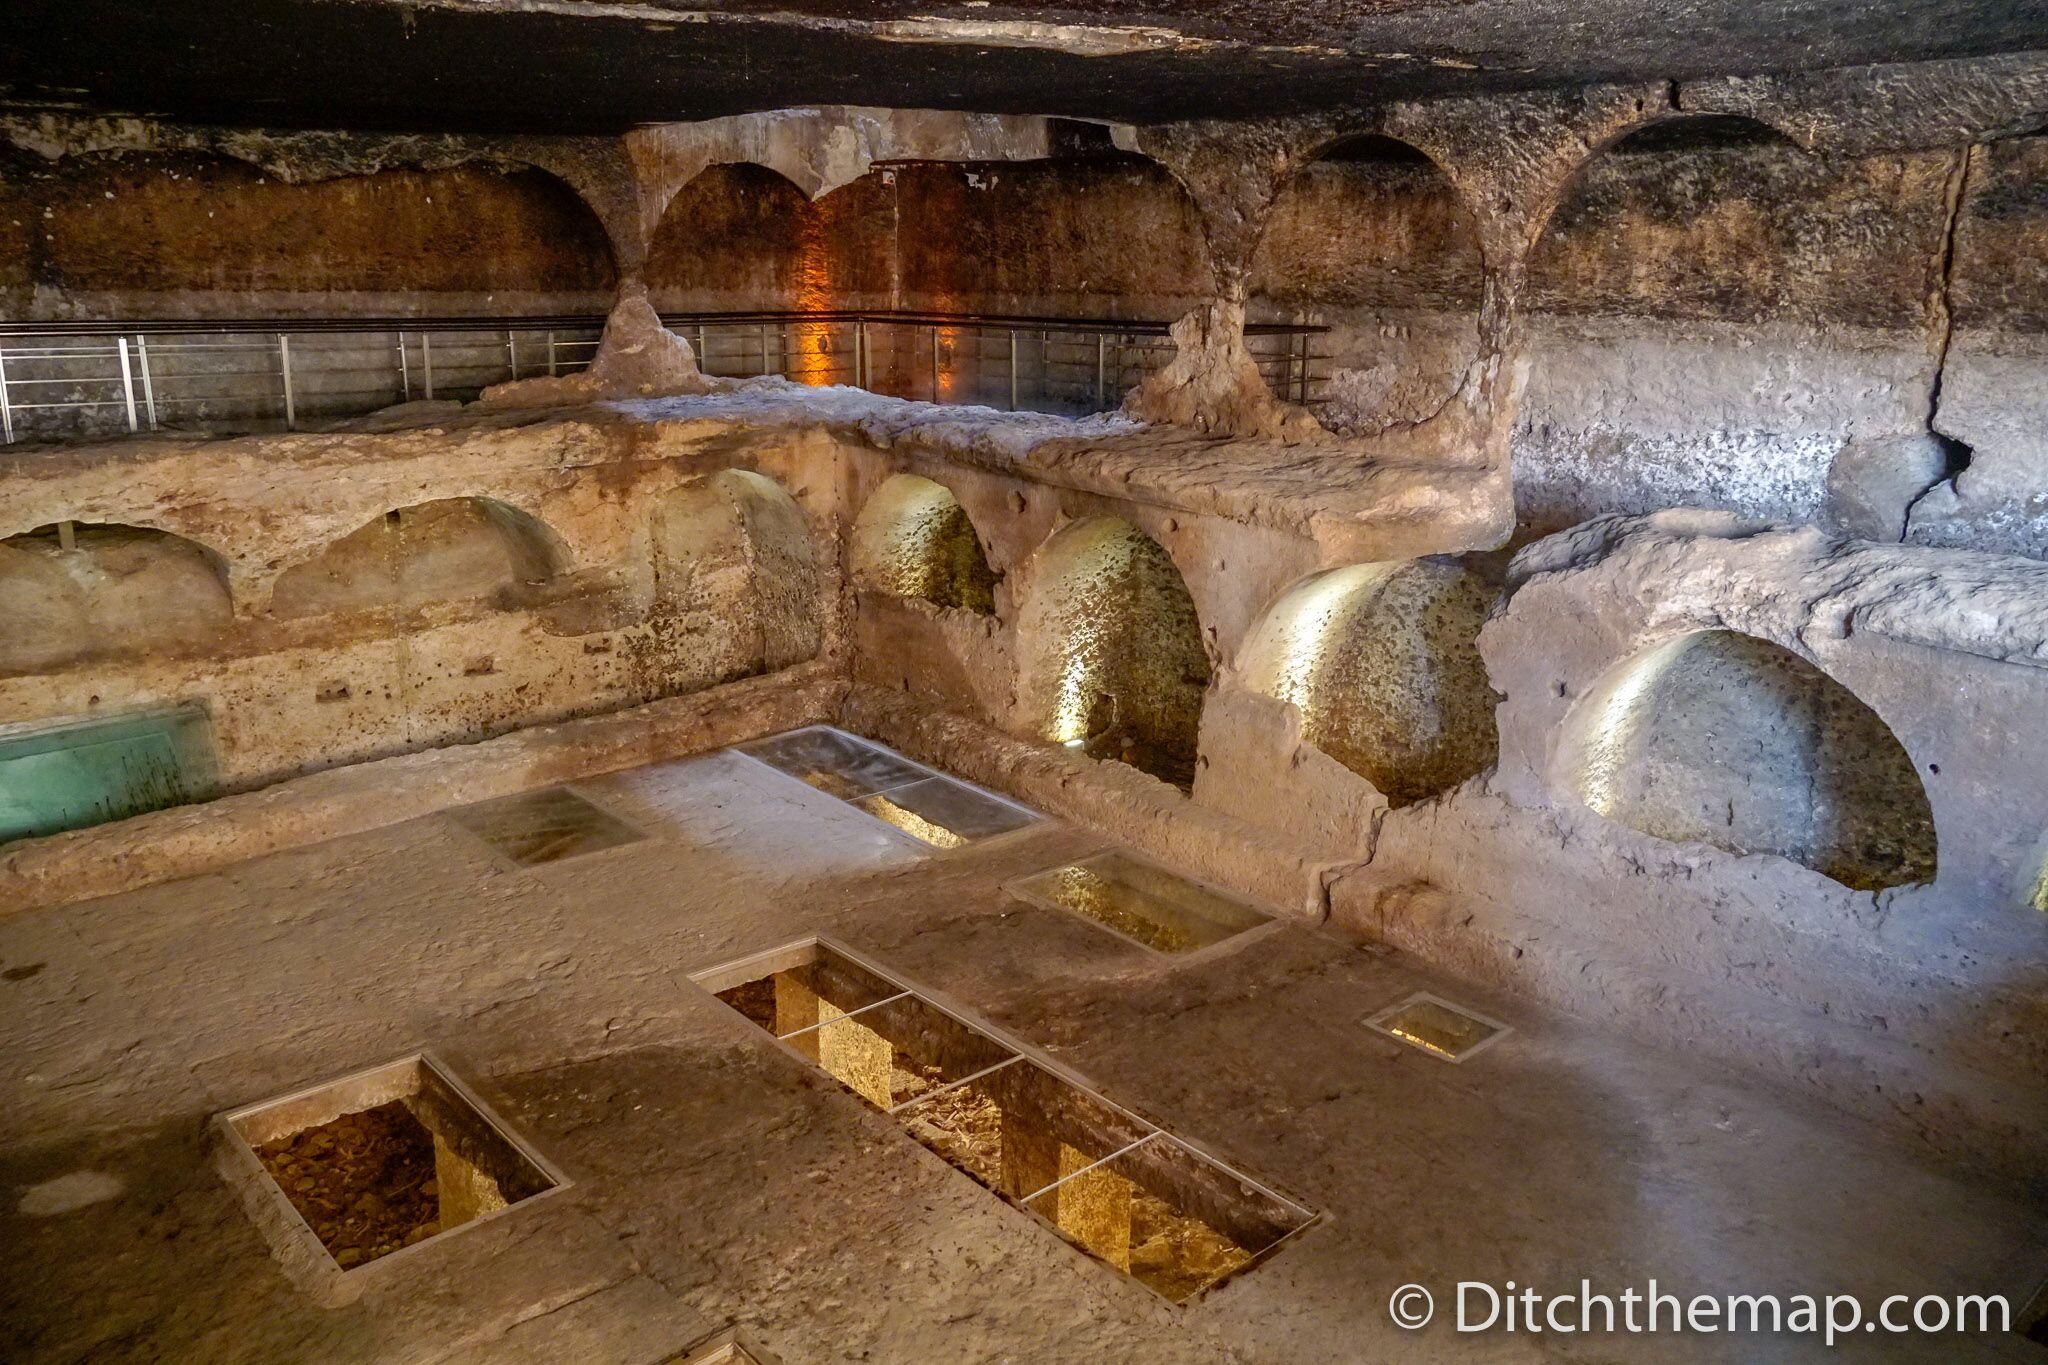 Gallery grave in Dara, Turkey